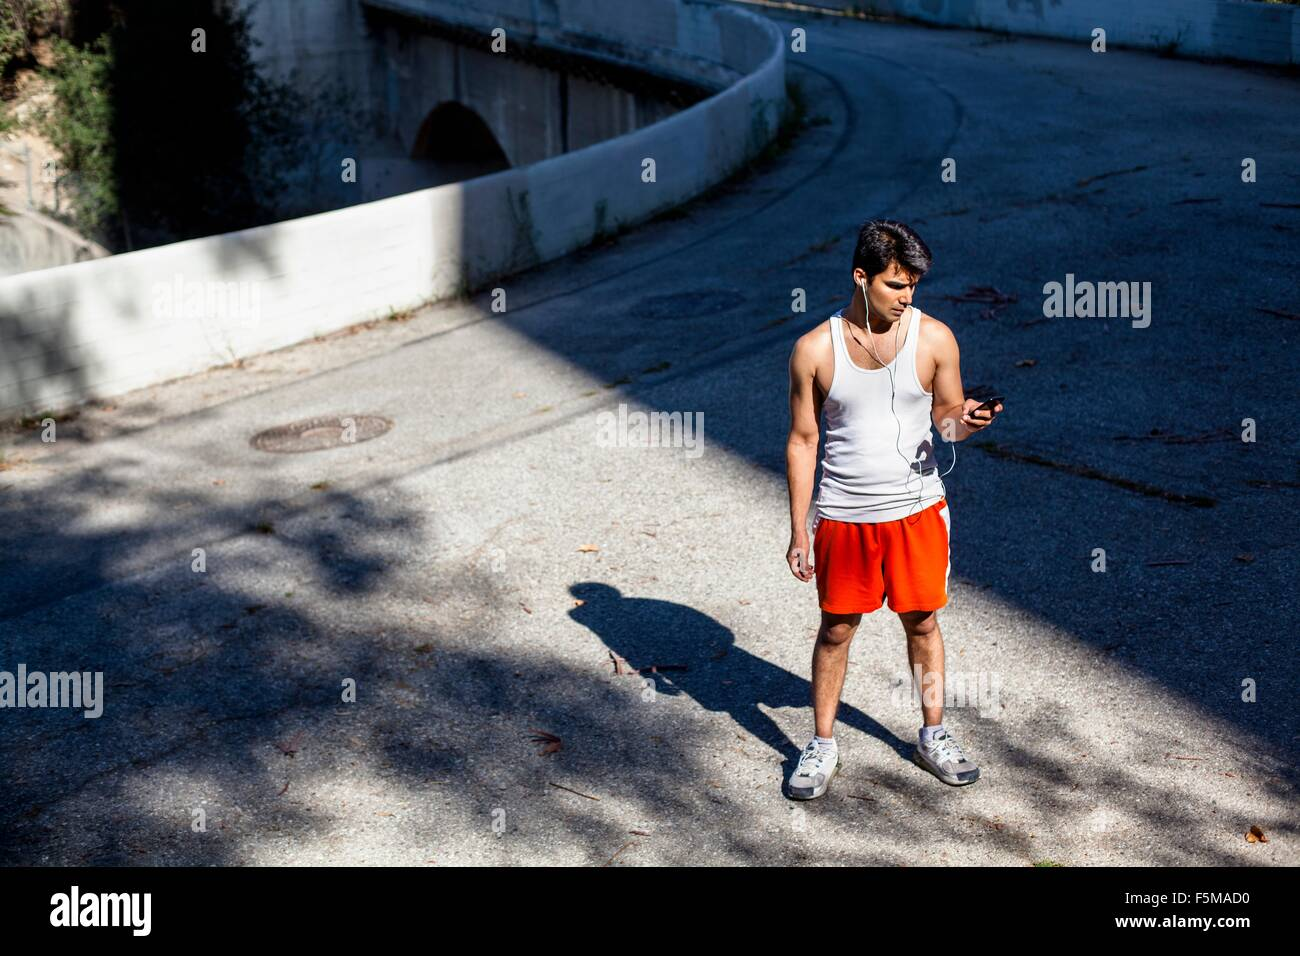 Jogger selecting music on smartphone, Arroyo Seco Park, Pasadena, California, USA - Stock Image